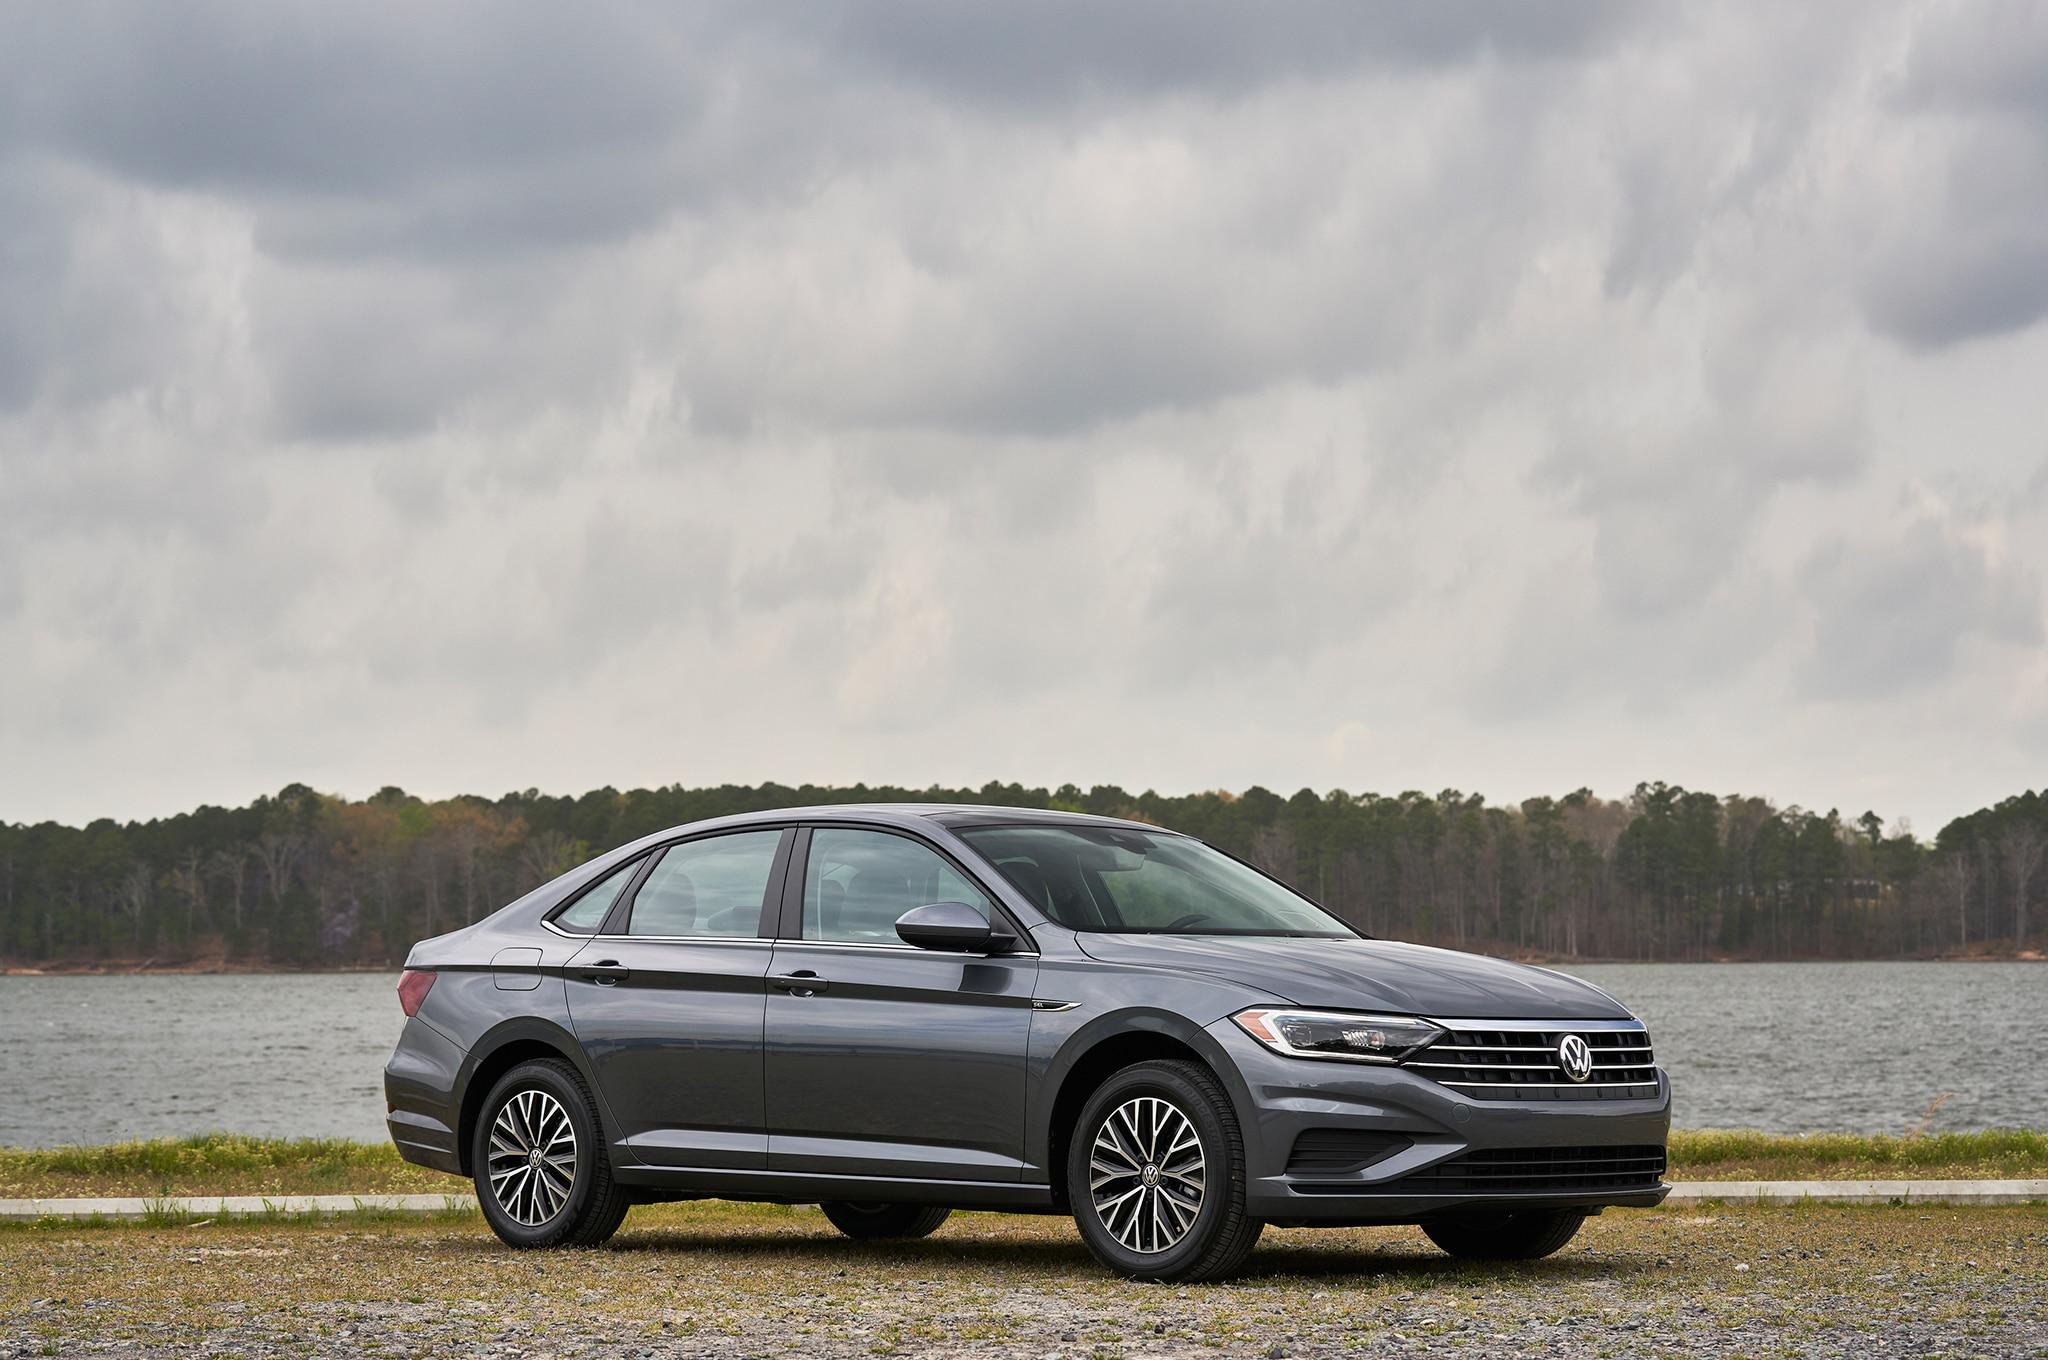 2019 Volkswagen Jetta First Drive Review